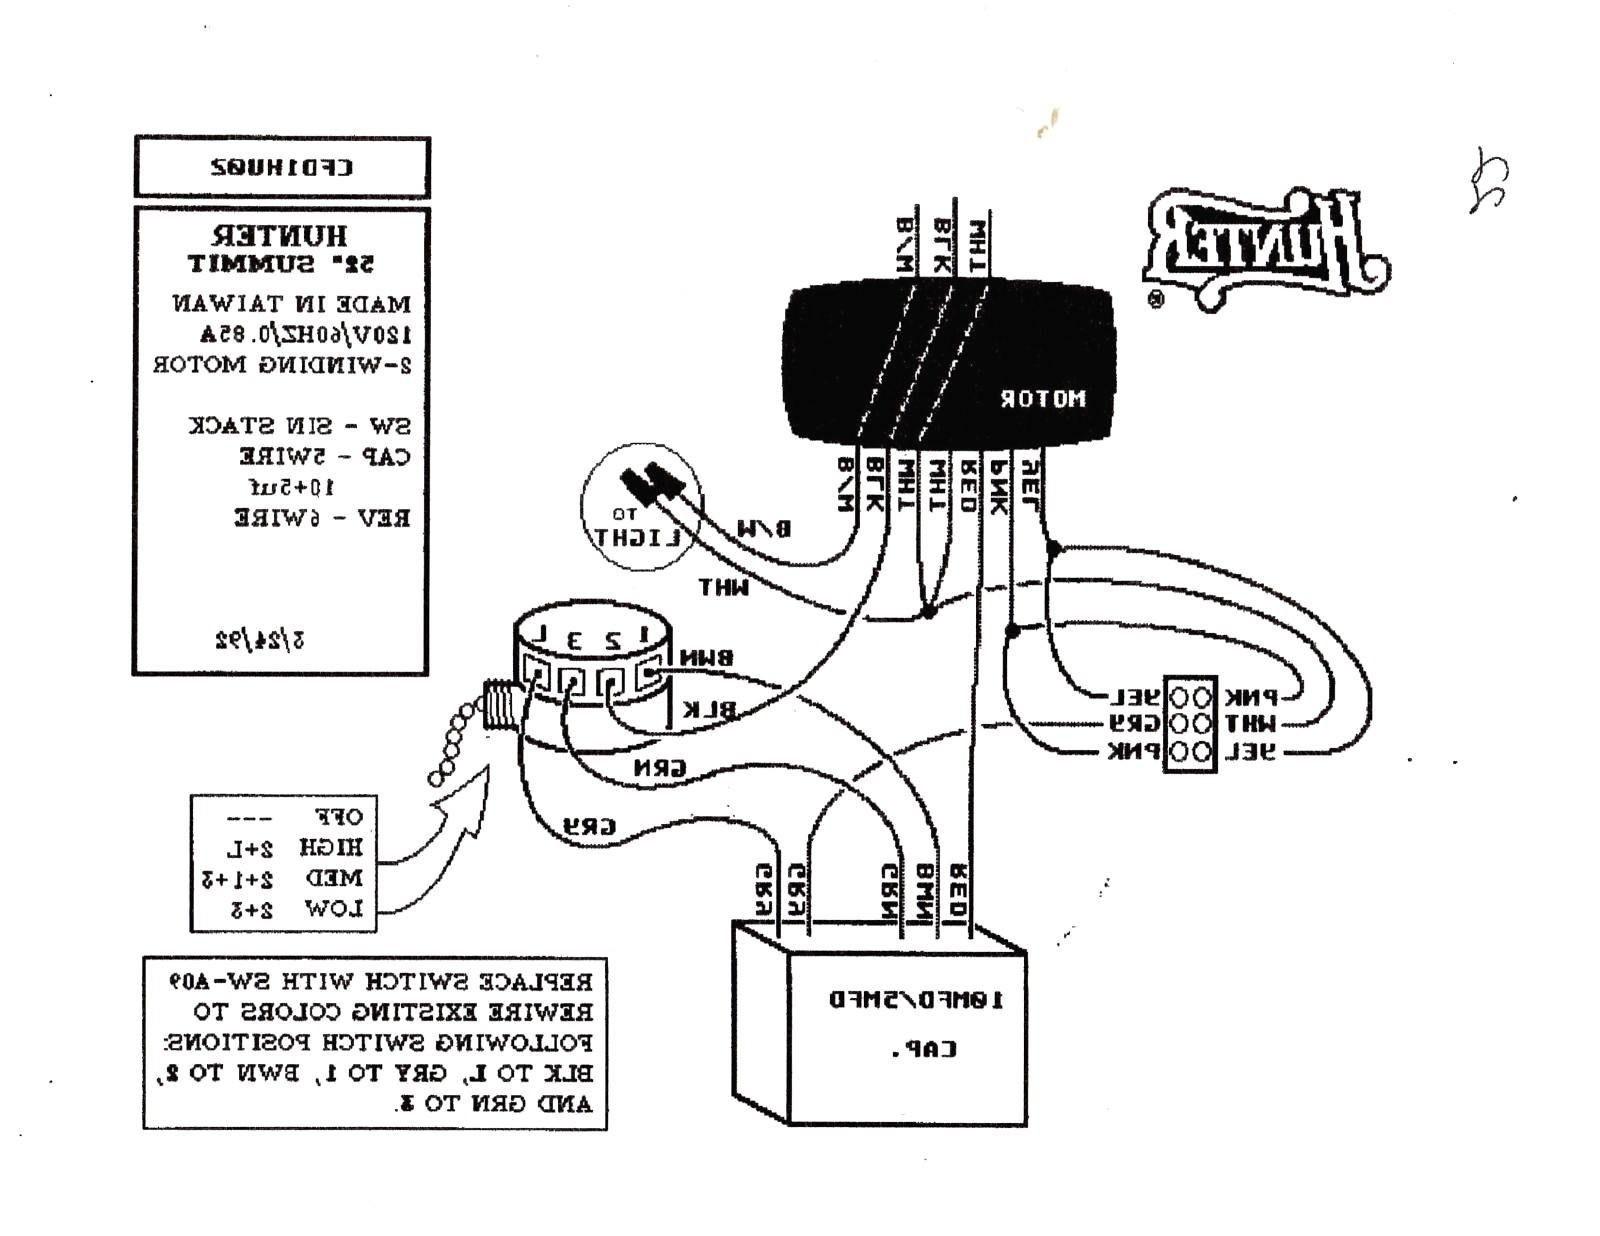 4 Wire Ceiling Fan Switch Wiring Diagram New Wiring Diagram for Ceiling Fan Switch New Hunter